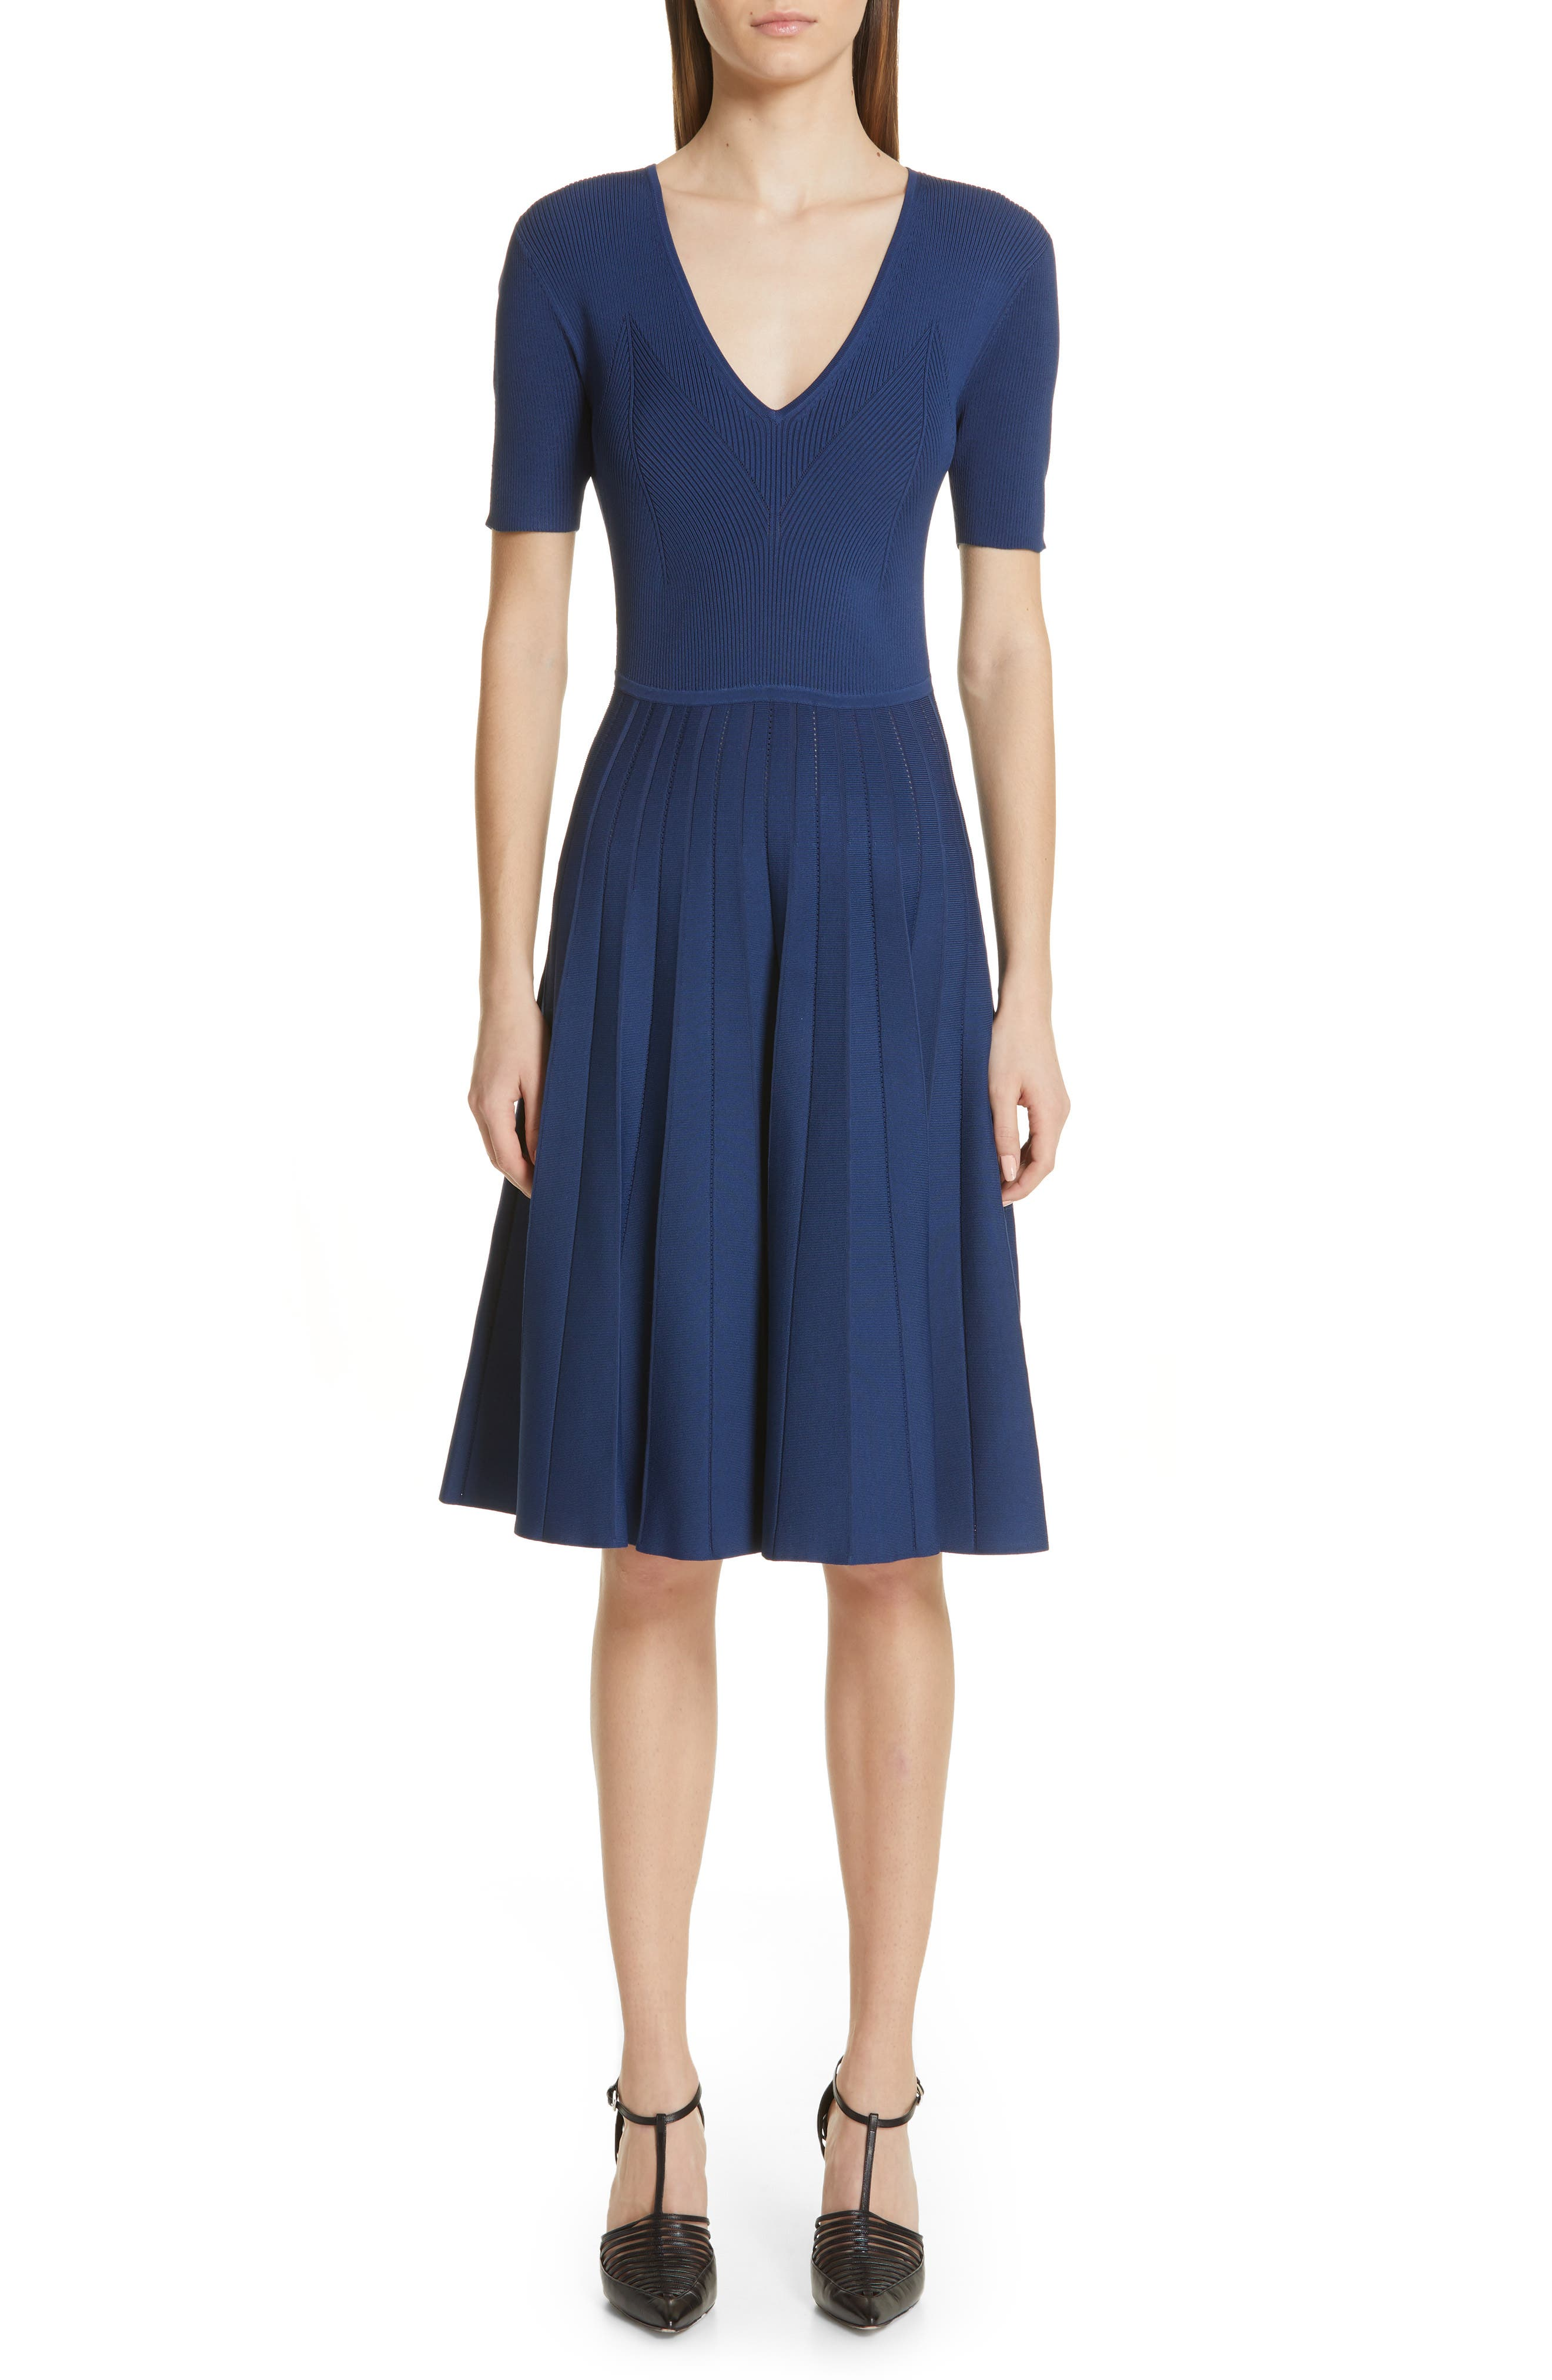 Jason Wu Collection Knit Fit & Flare Dress, Blue